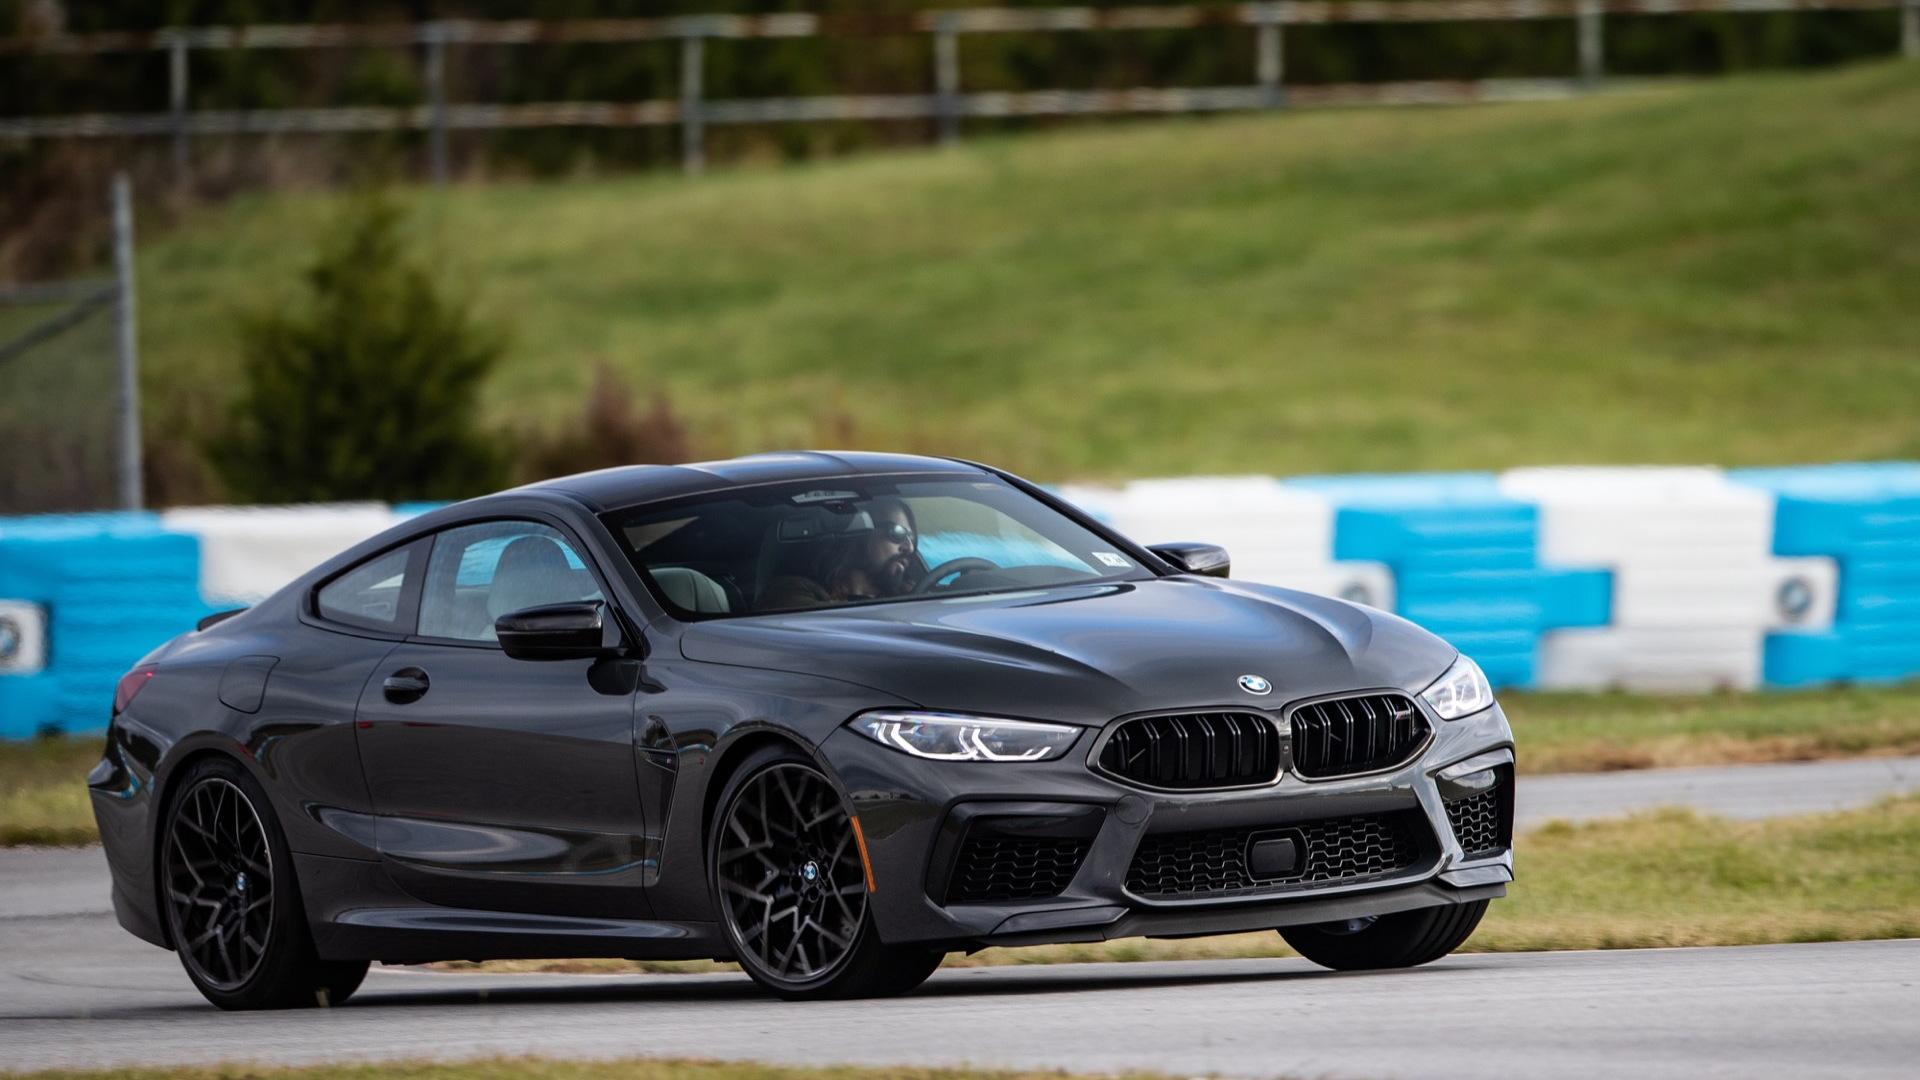 2020 BMW M8 Images